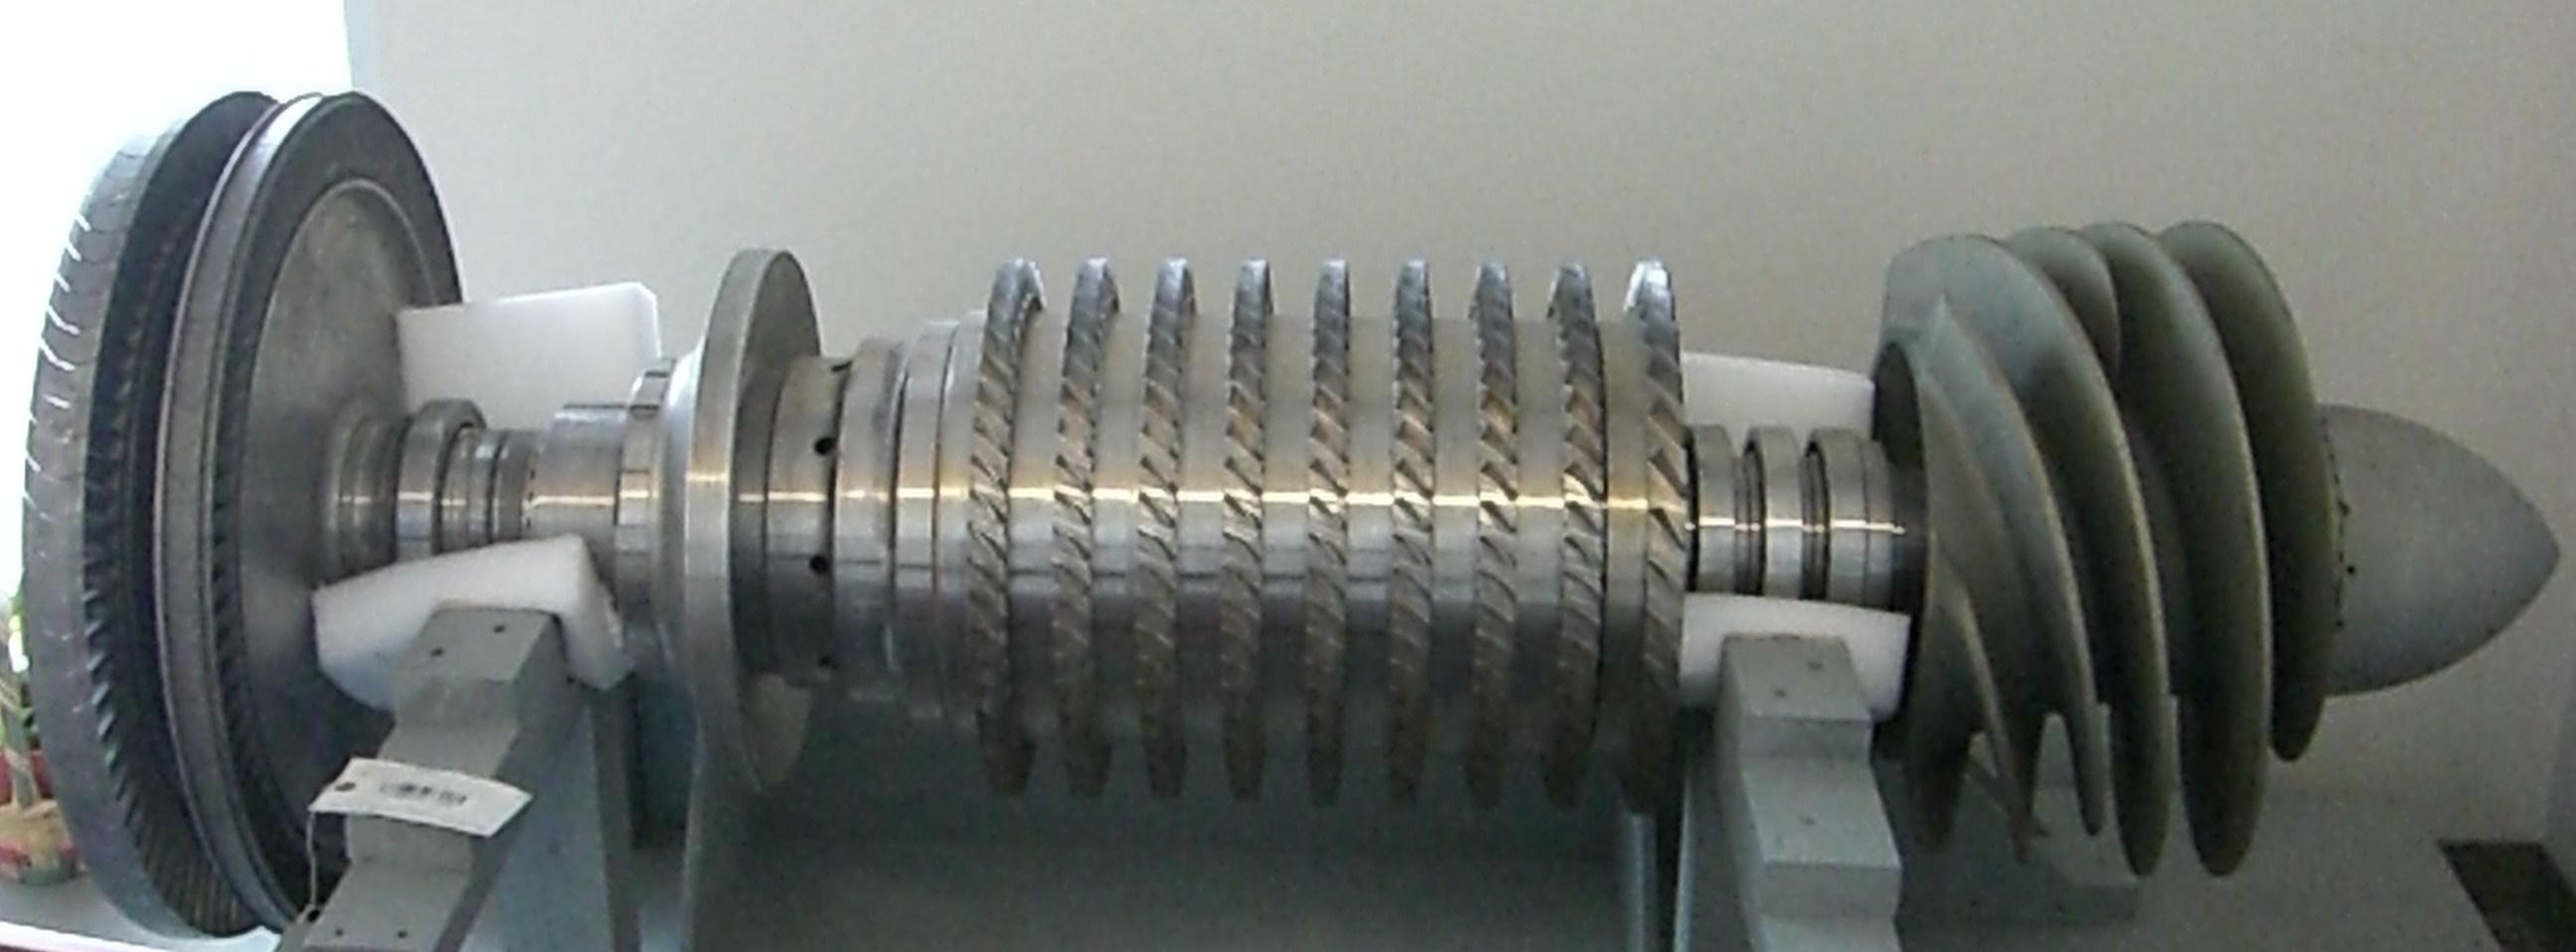 Turbopump - Wikipedia